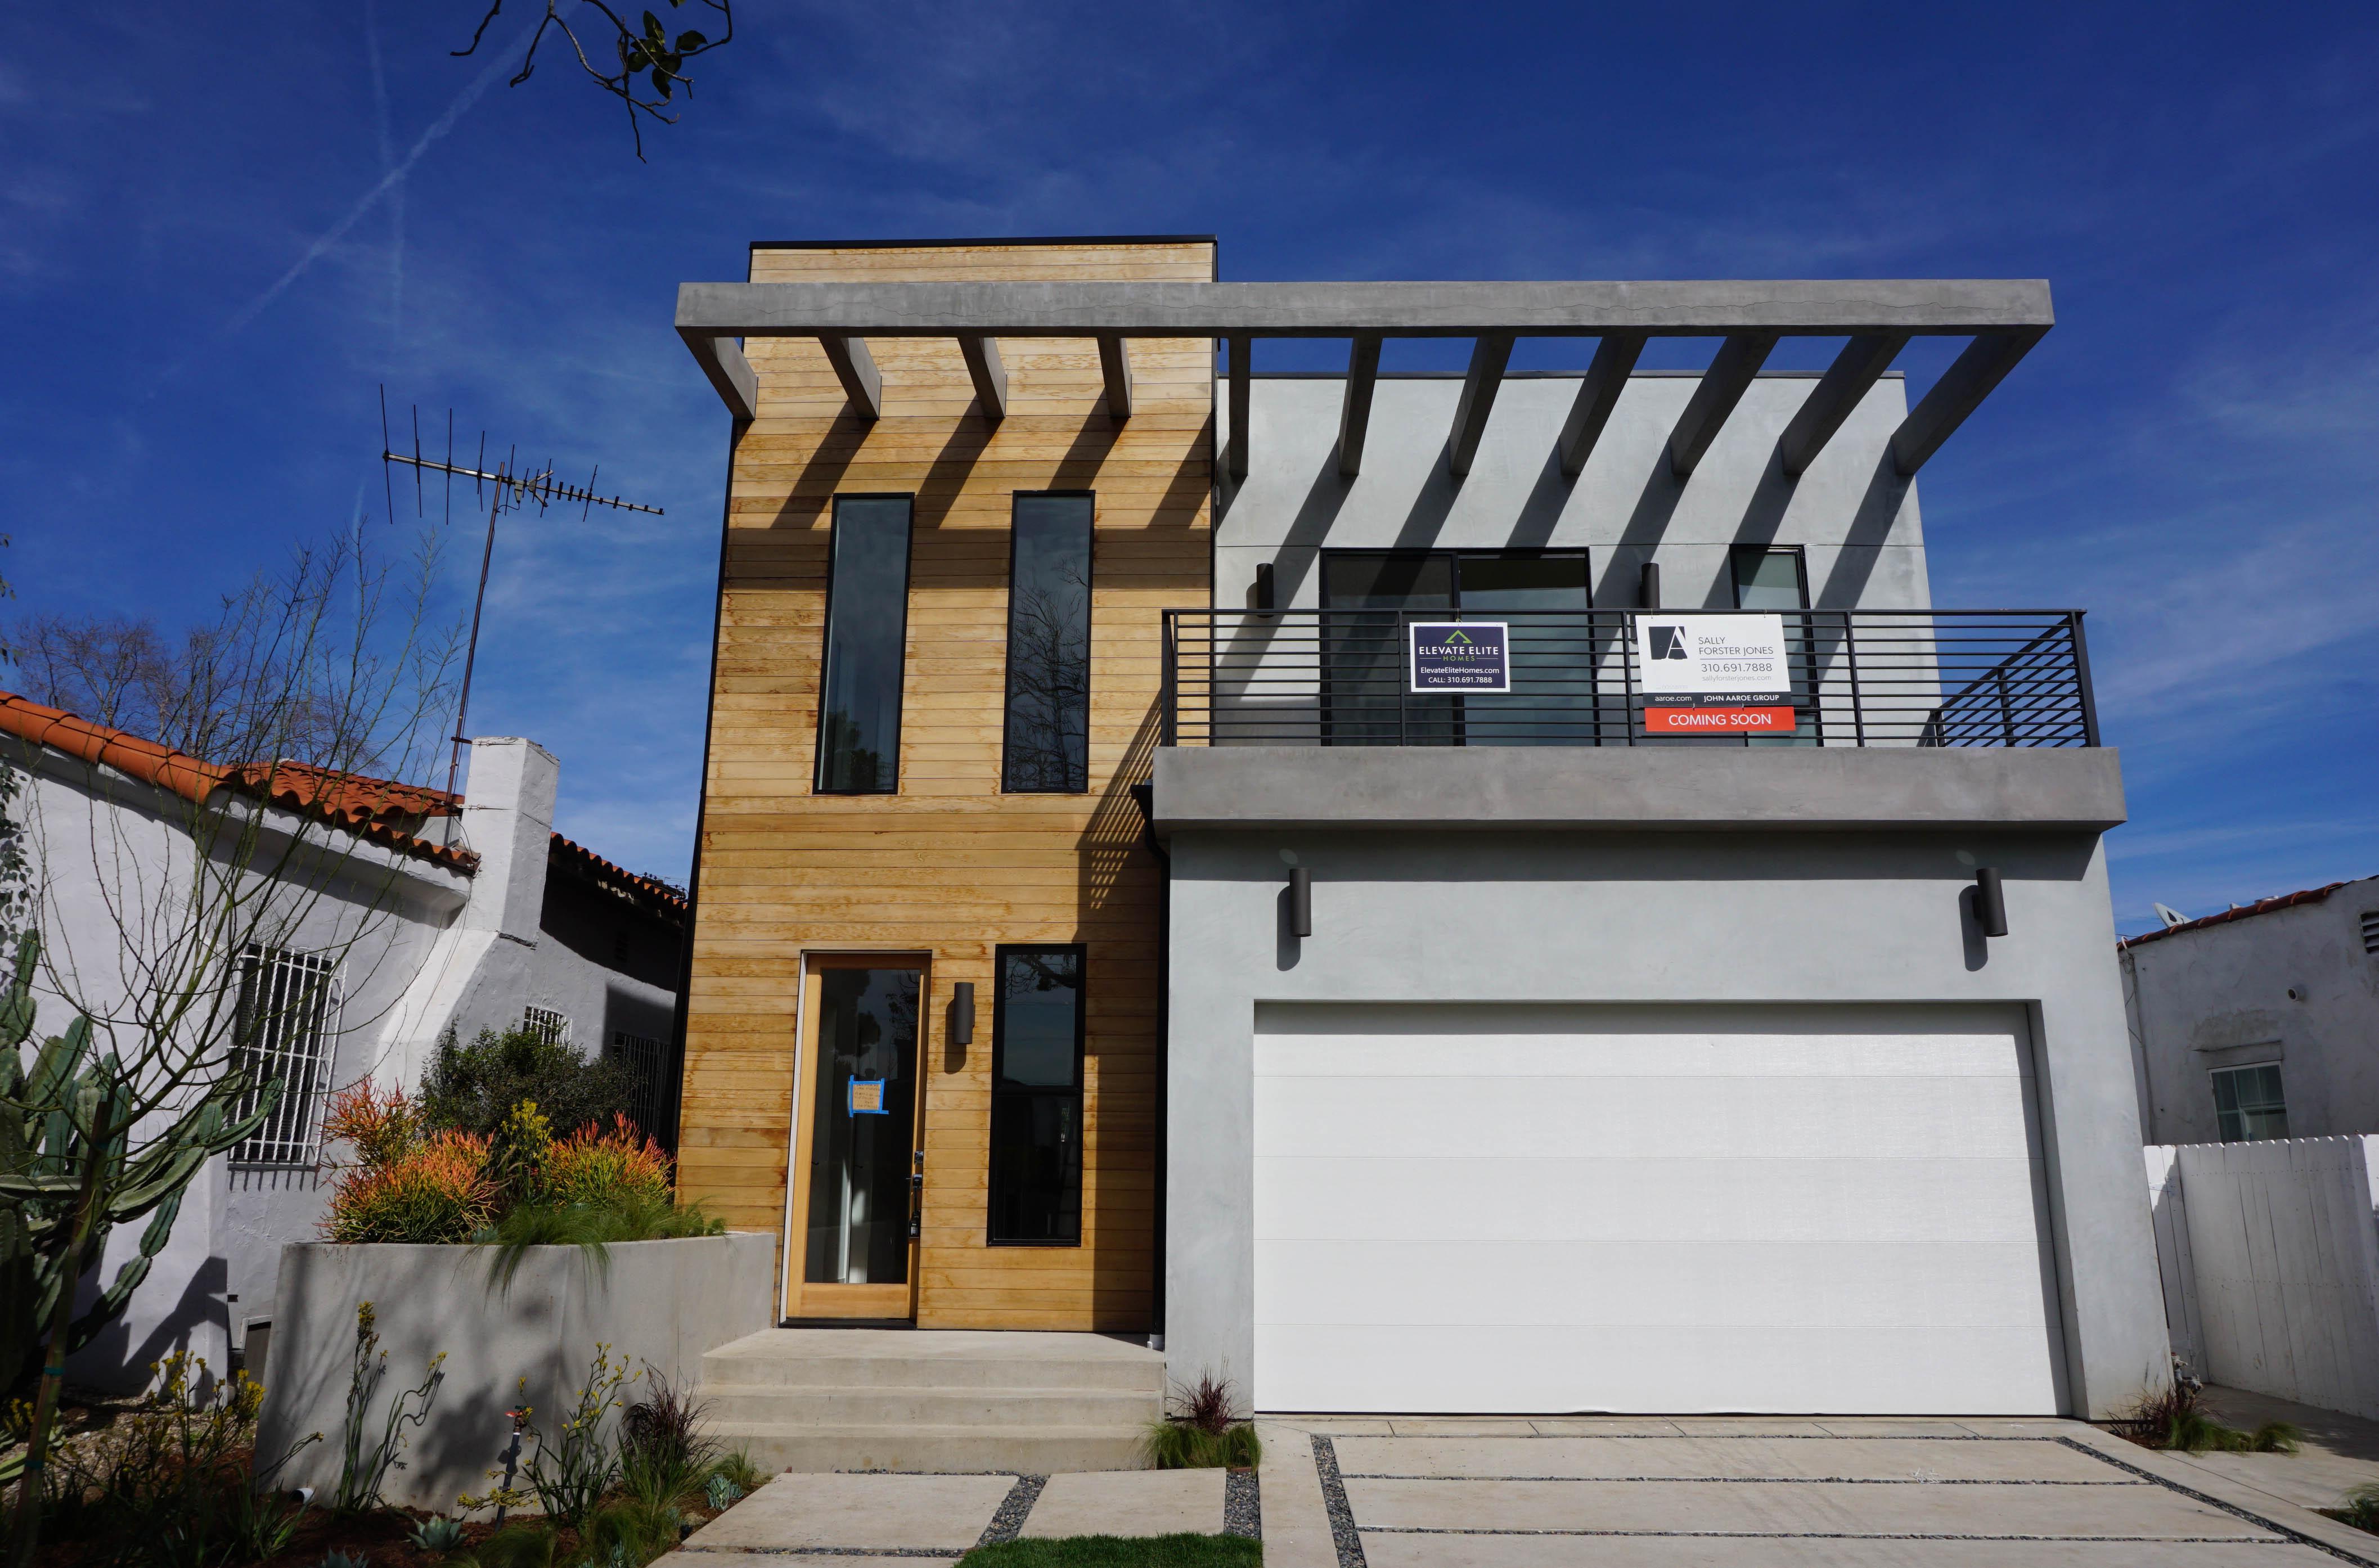 8921 Hargis-2017 house, photo by Elisa Leonelli